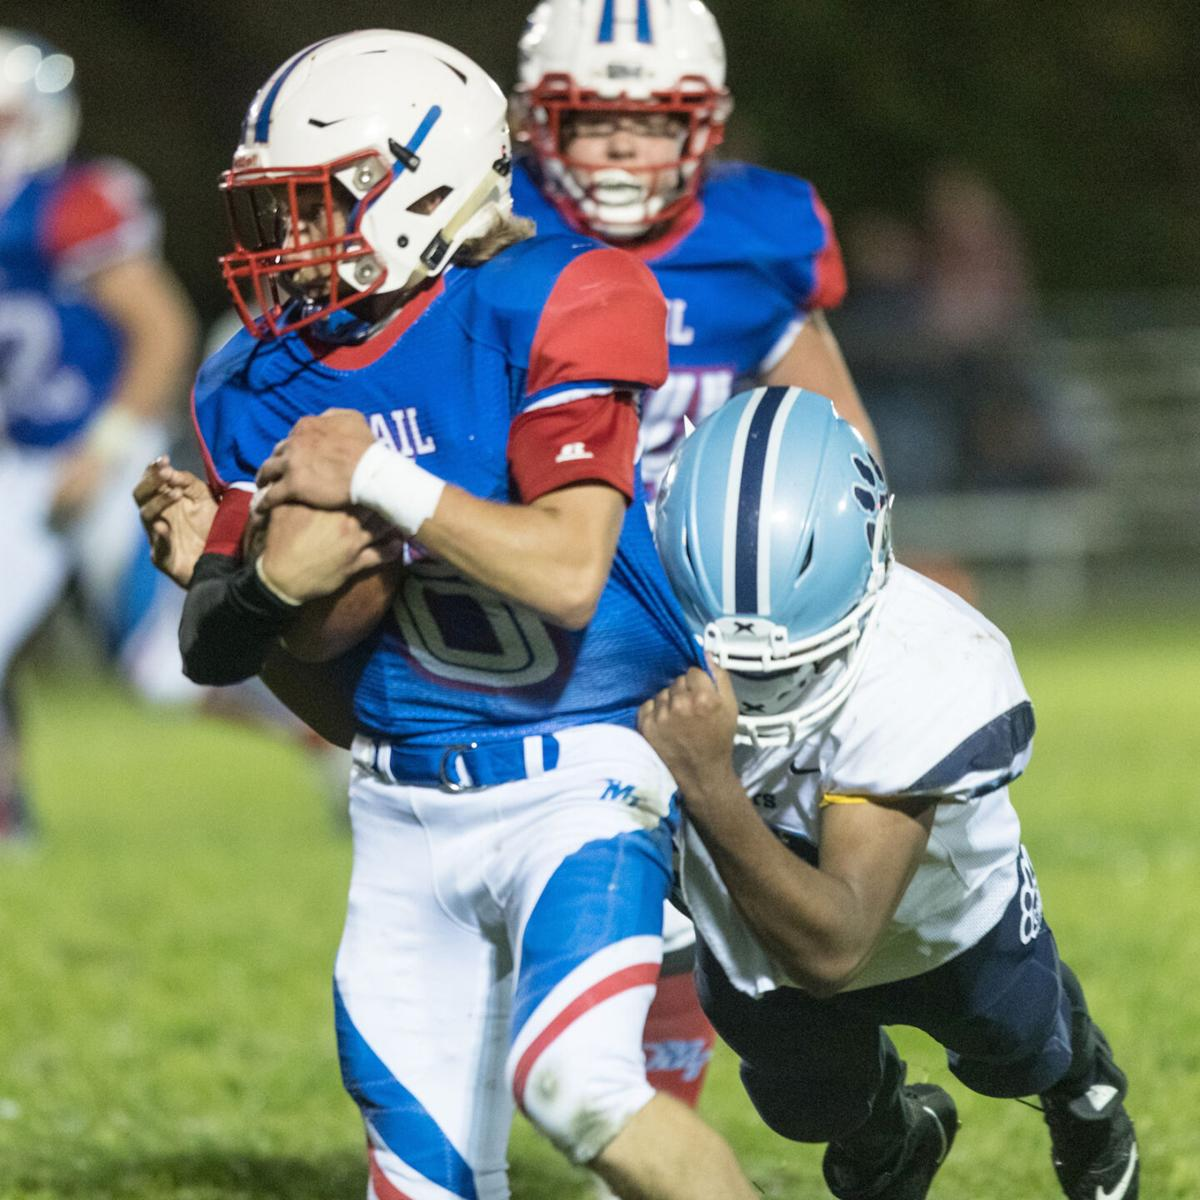 Ruffner tackled